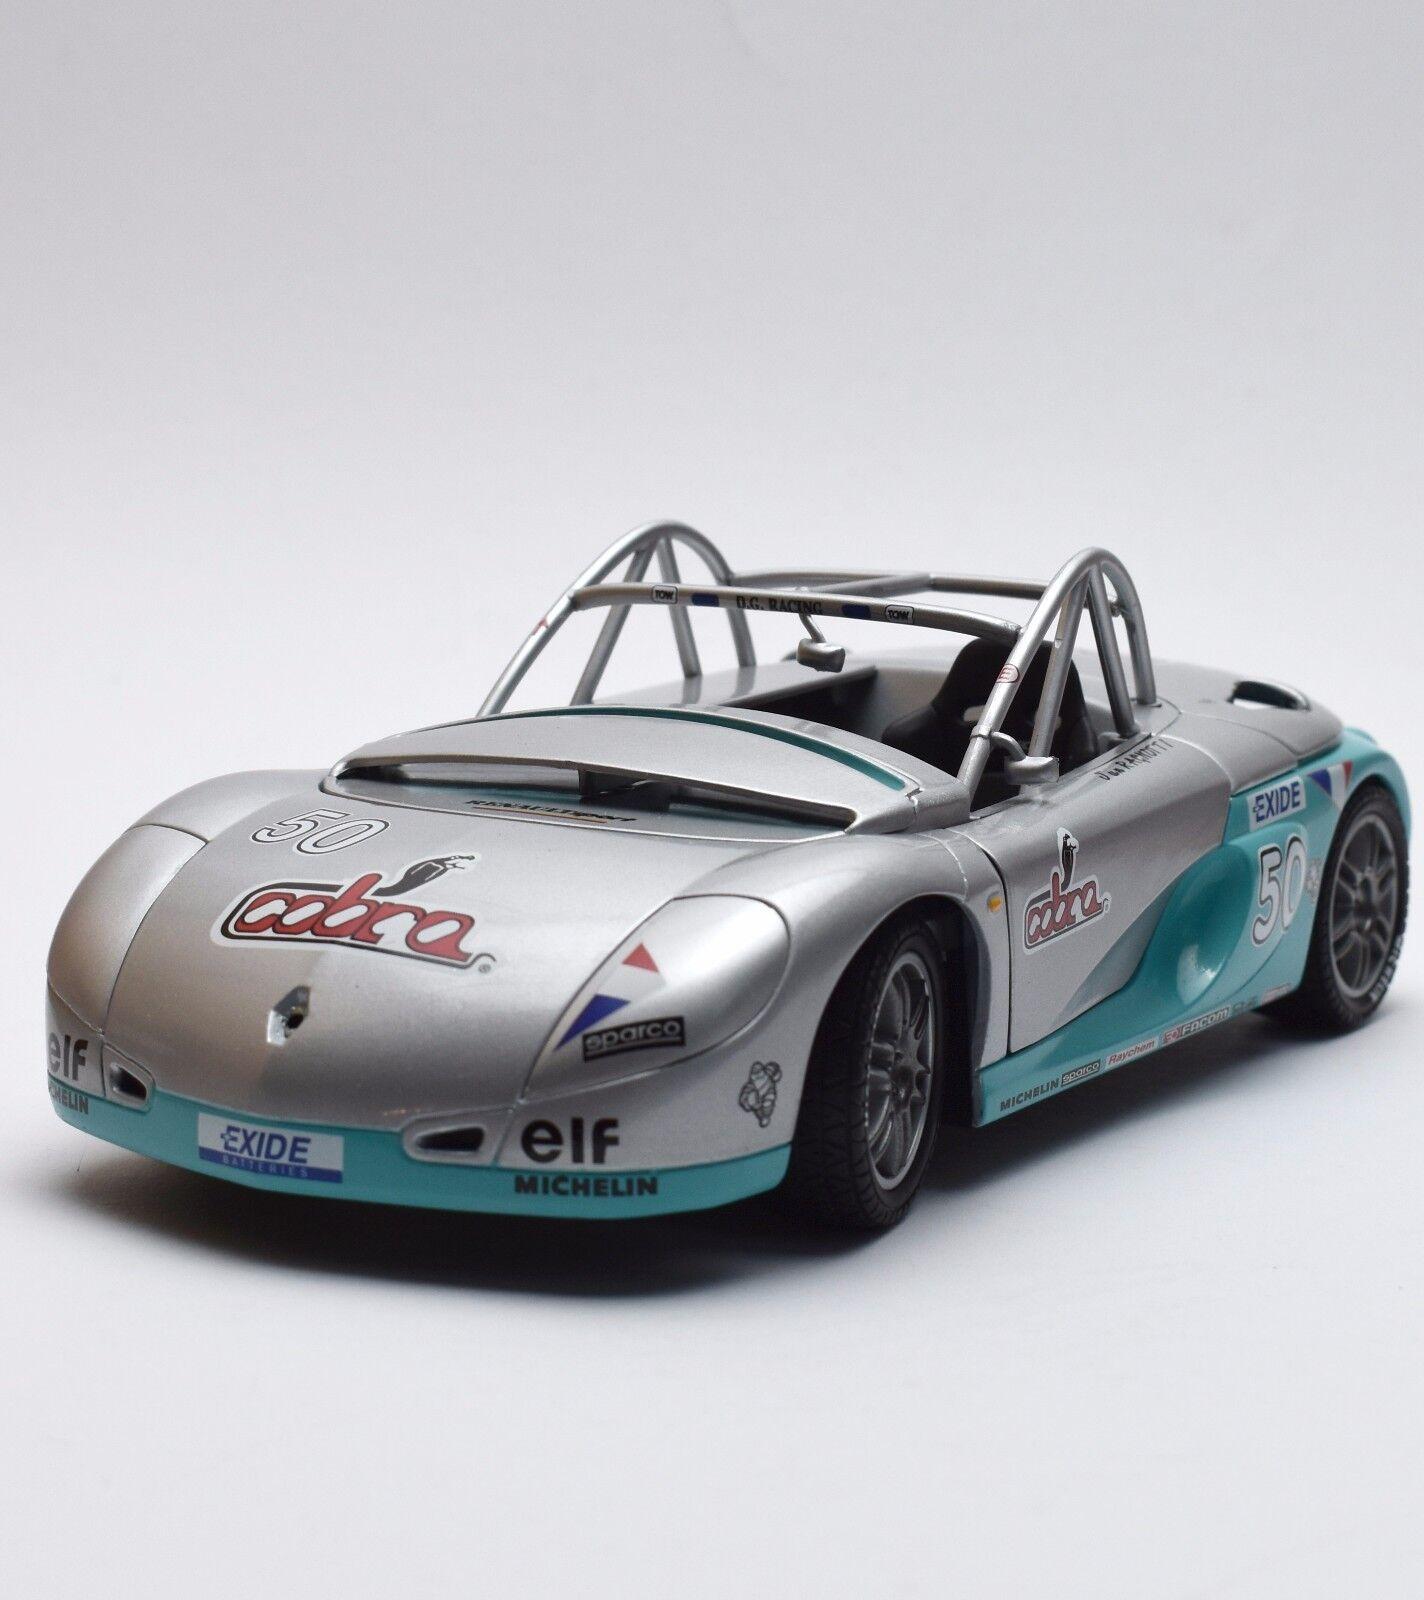 alta quaità Anson RACING RACING RACING Renault Spider auto sportive in argentooo laccato, OVP, 1 18, k006  molte concessioni